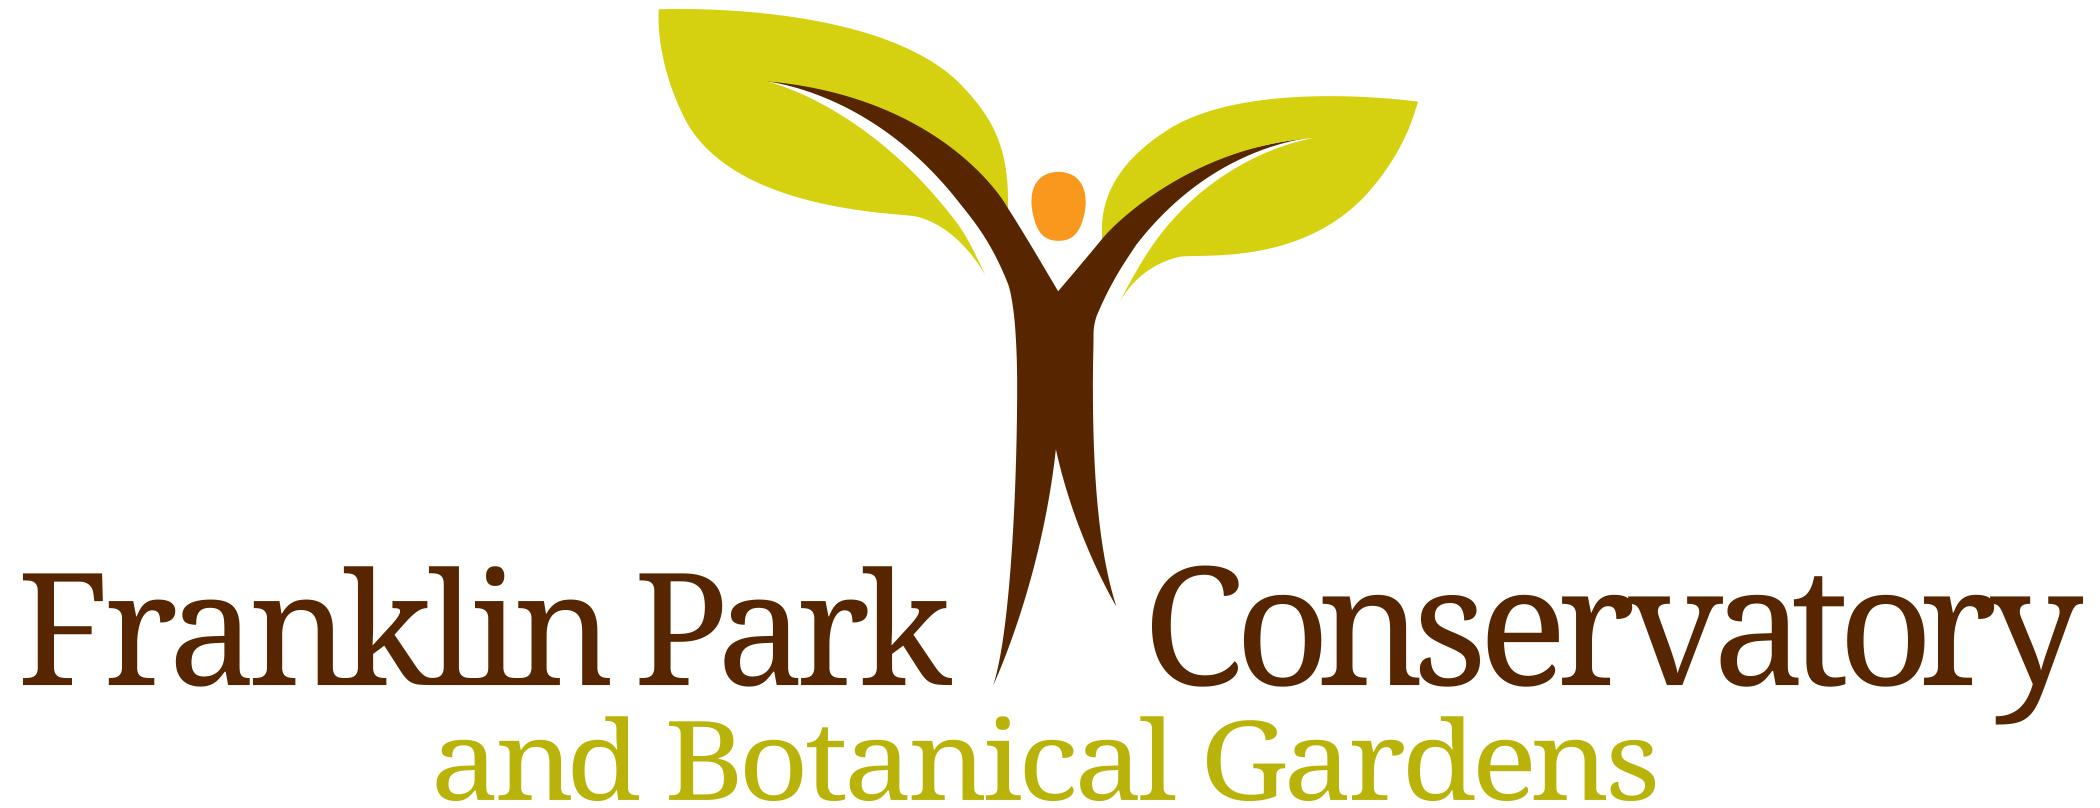 Franklin Park Conservatory and Botanical Gardens logo